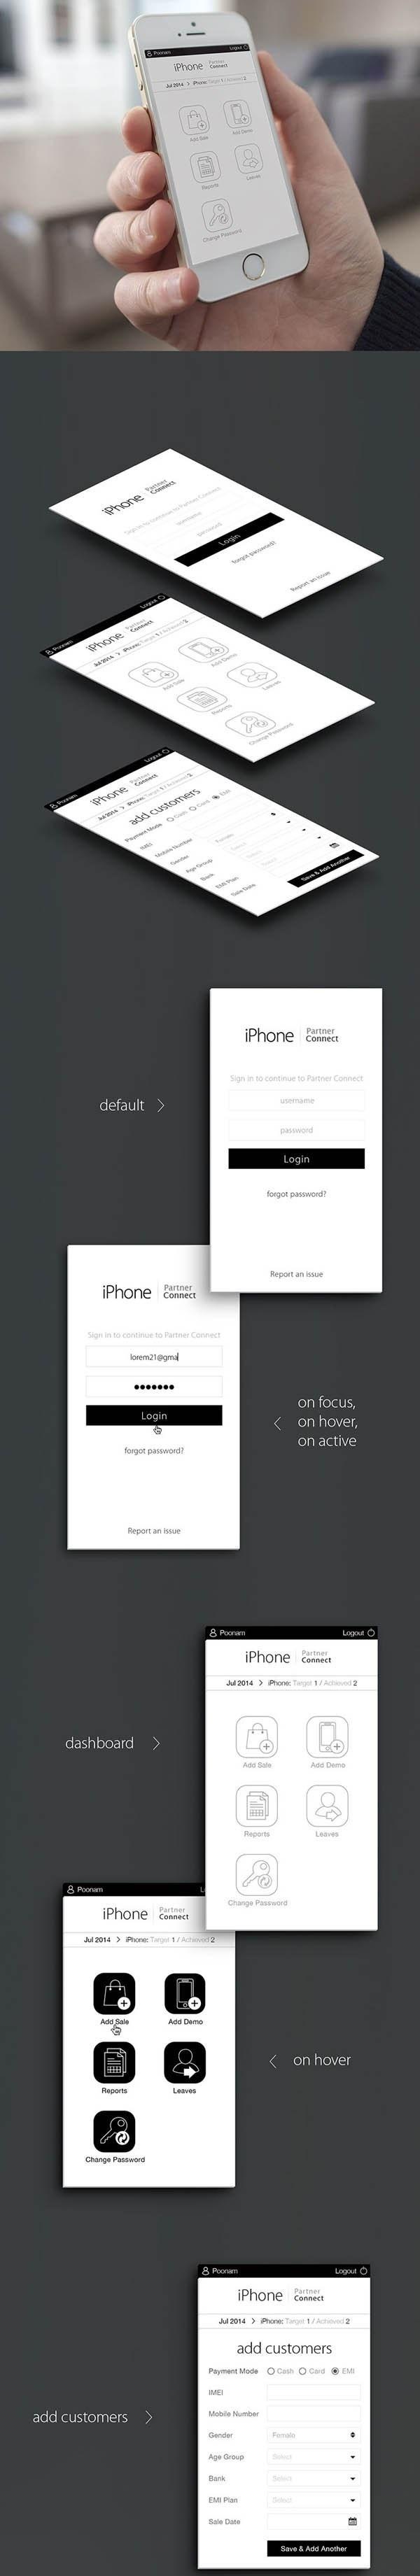 iPhone PC by Praveen Kumar